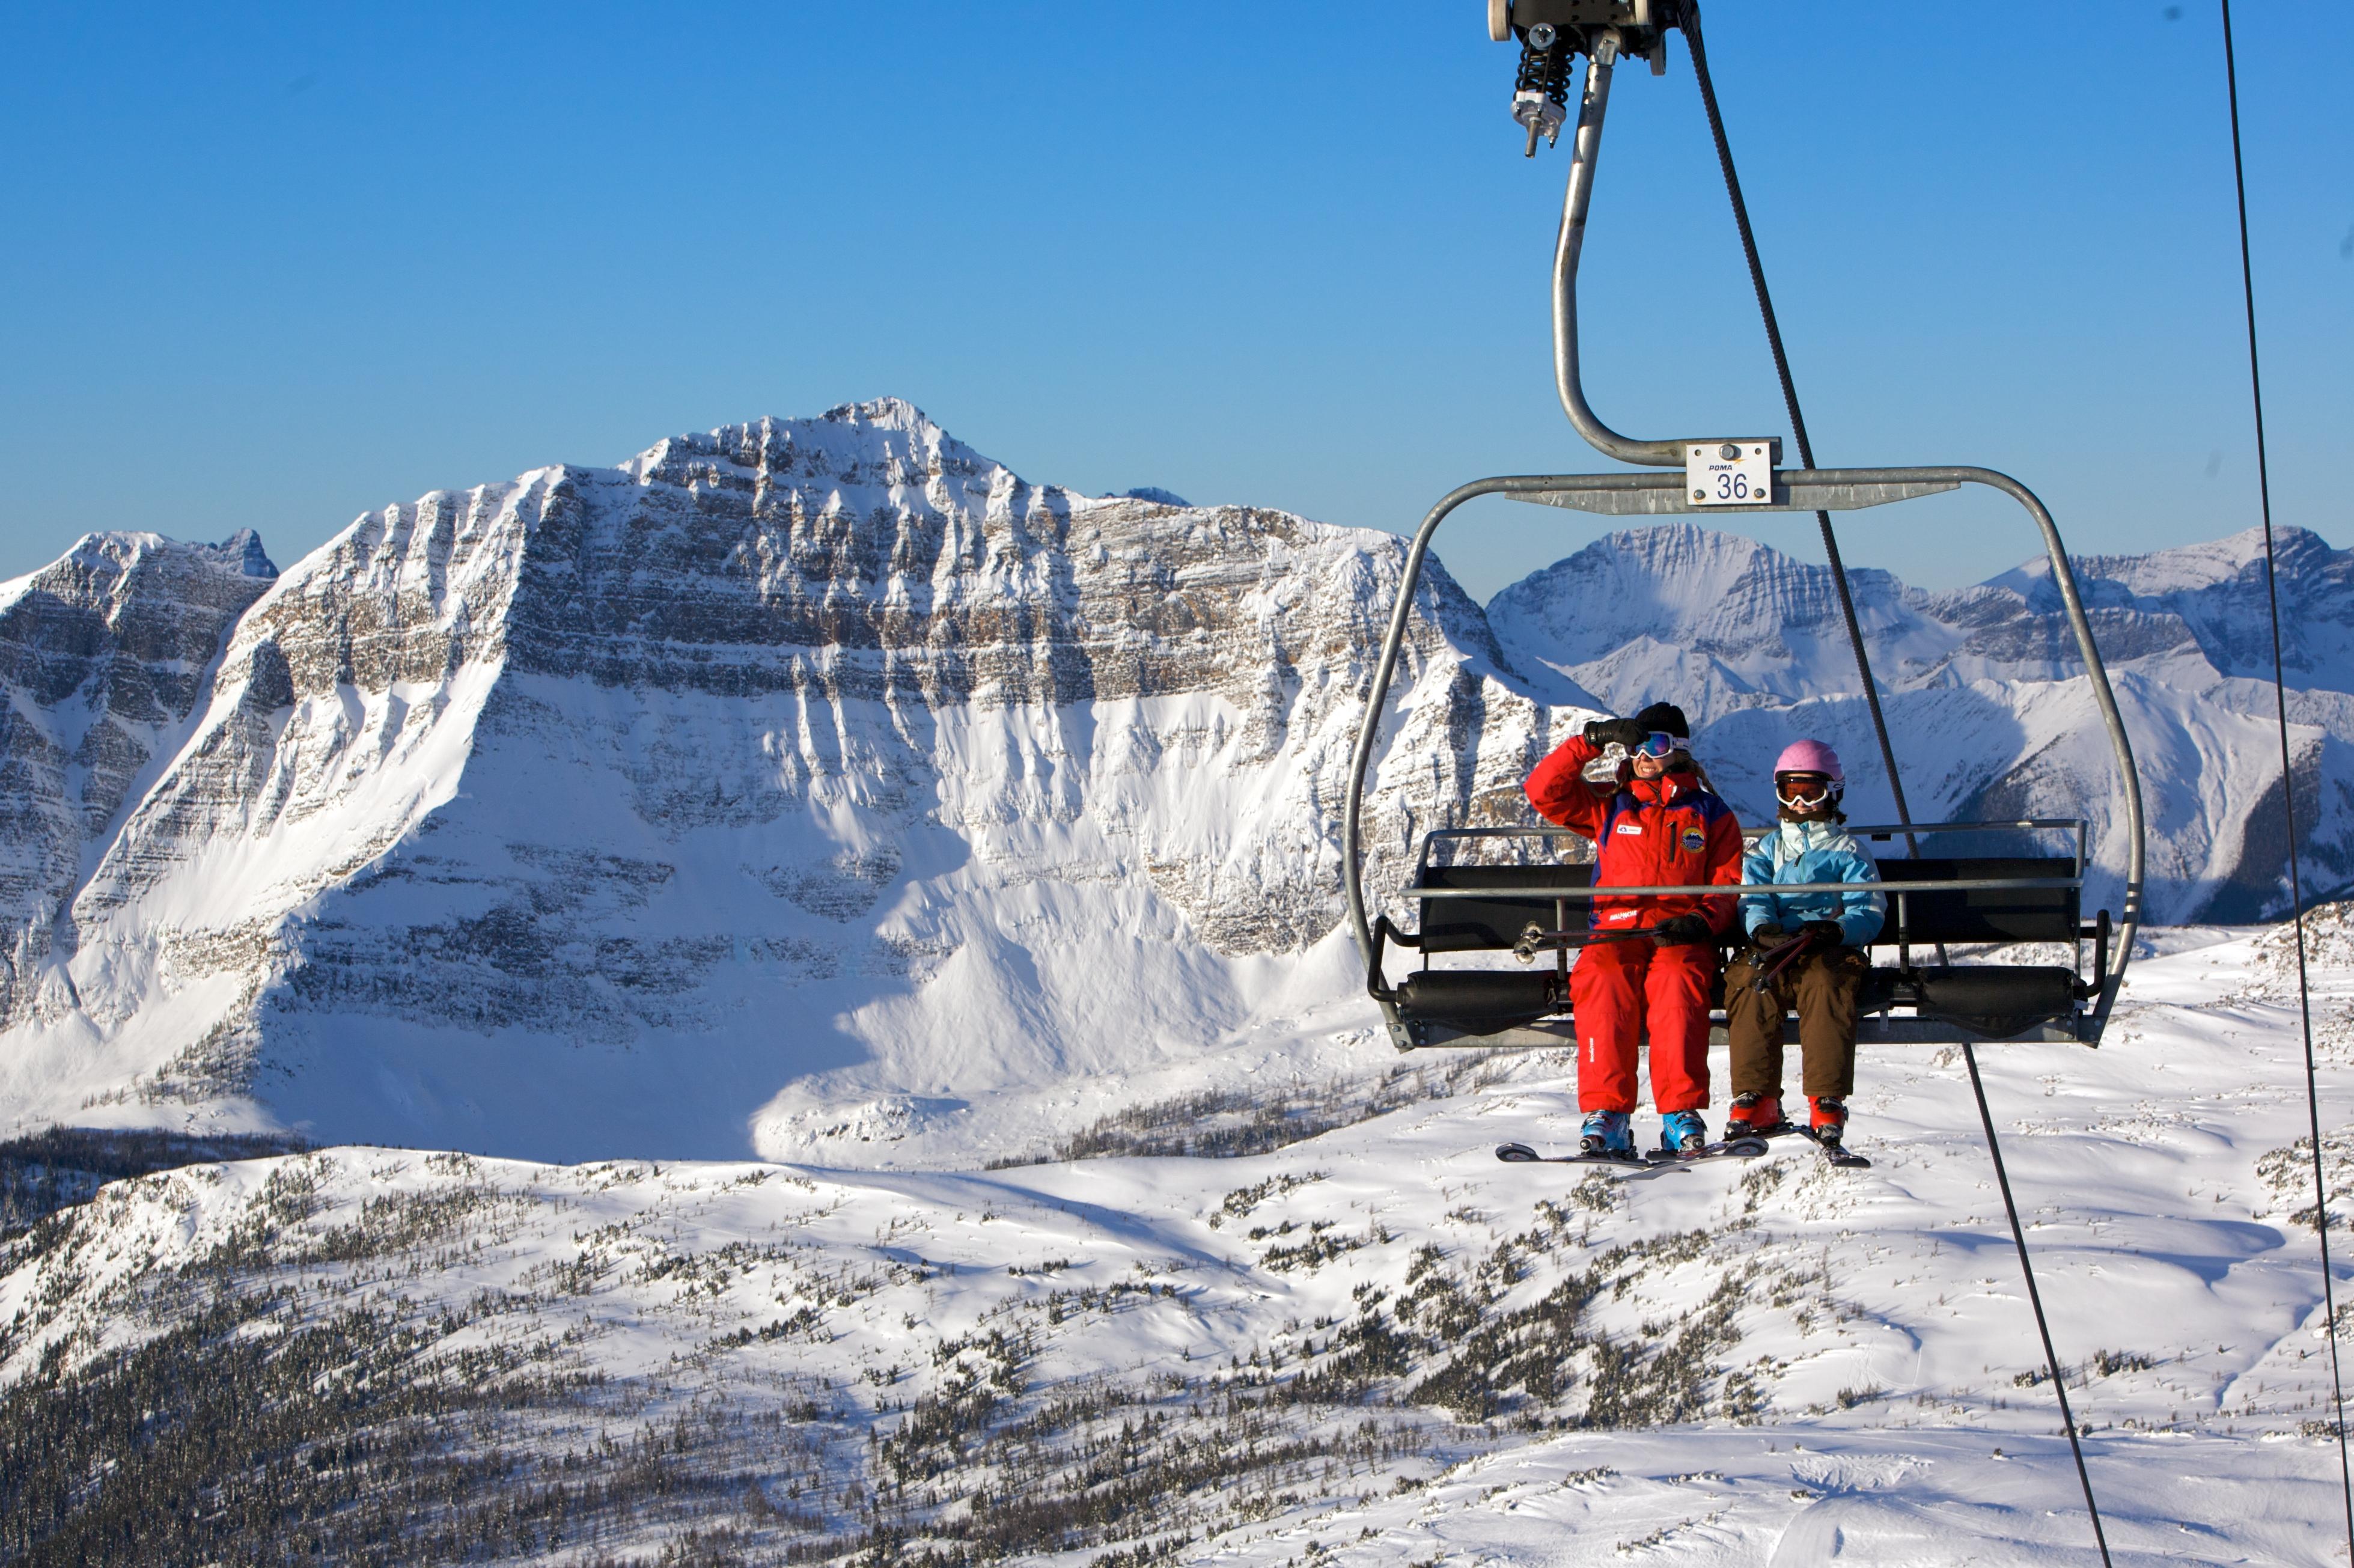 banff - sunshine village - ski club of great britain